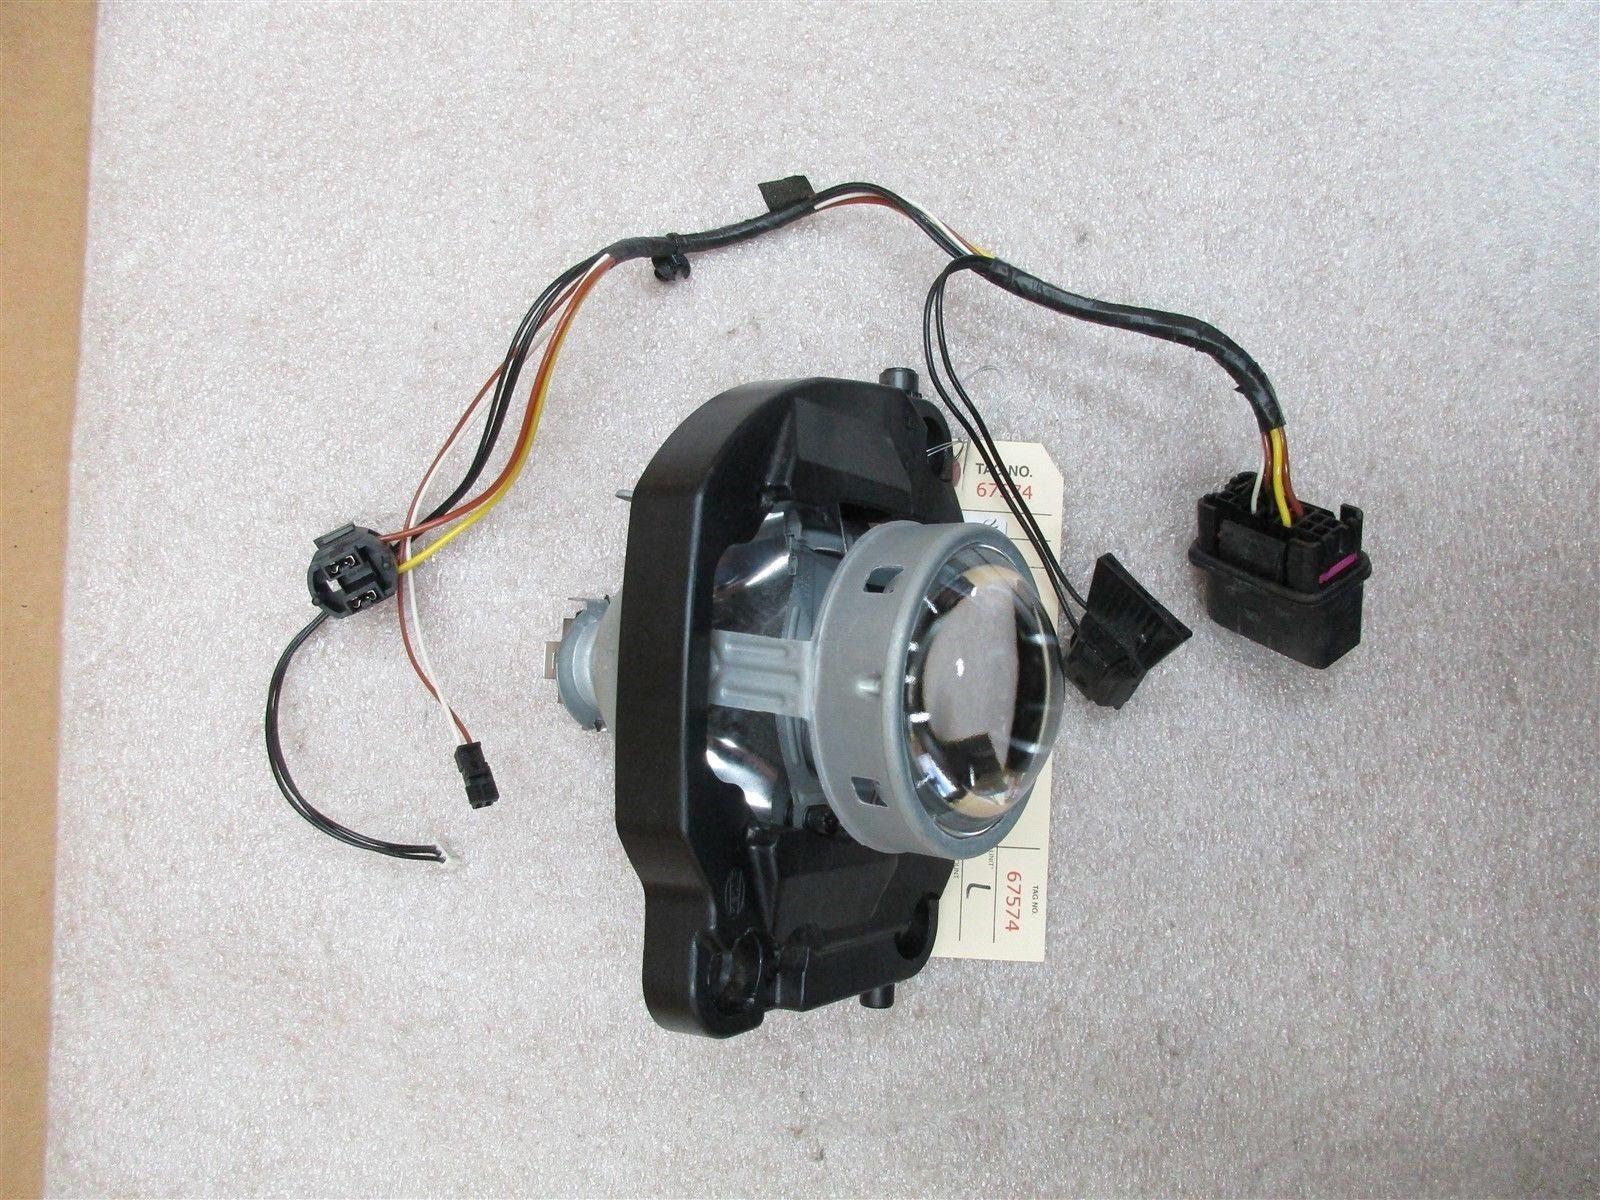 08 cayenne s awd porsche 957 l headlight hardware wiring harness 122 873 [ 1600 x 1200 Pixel ]